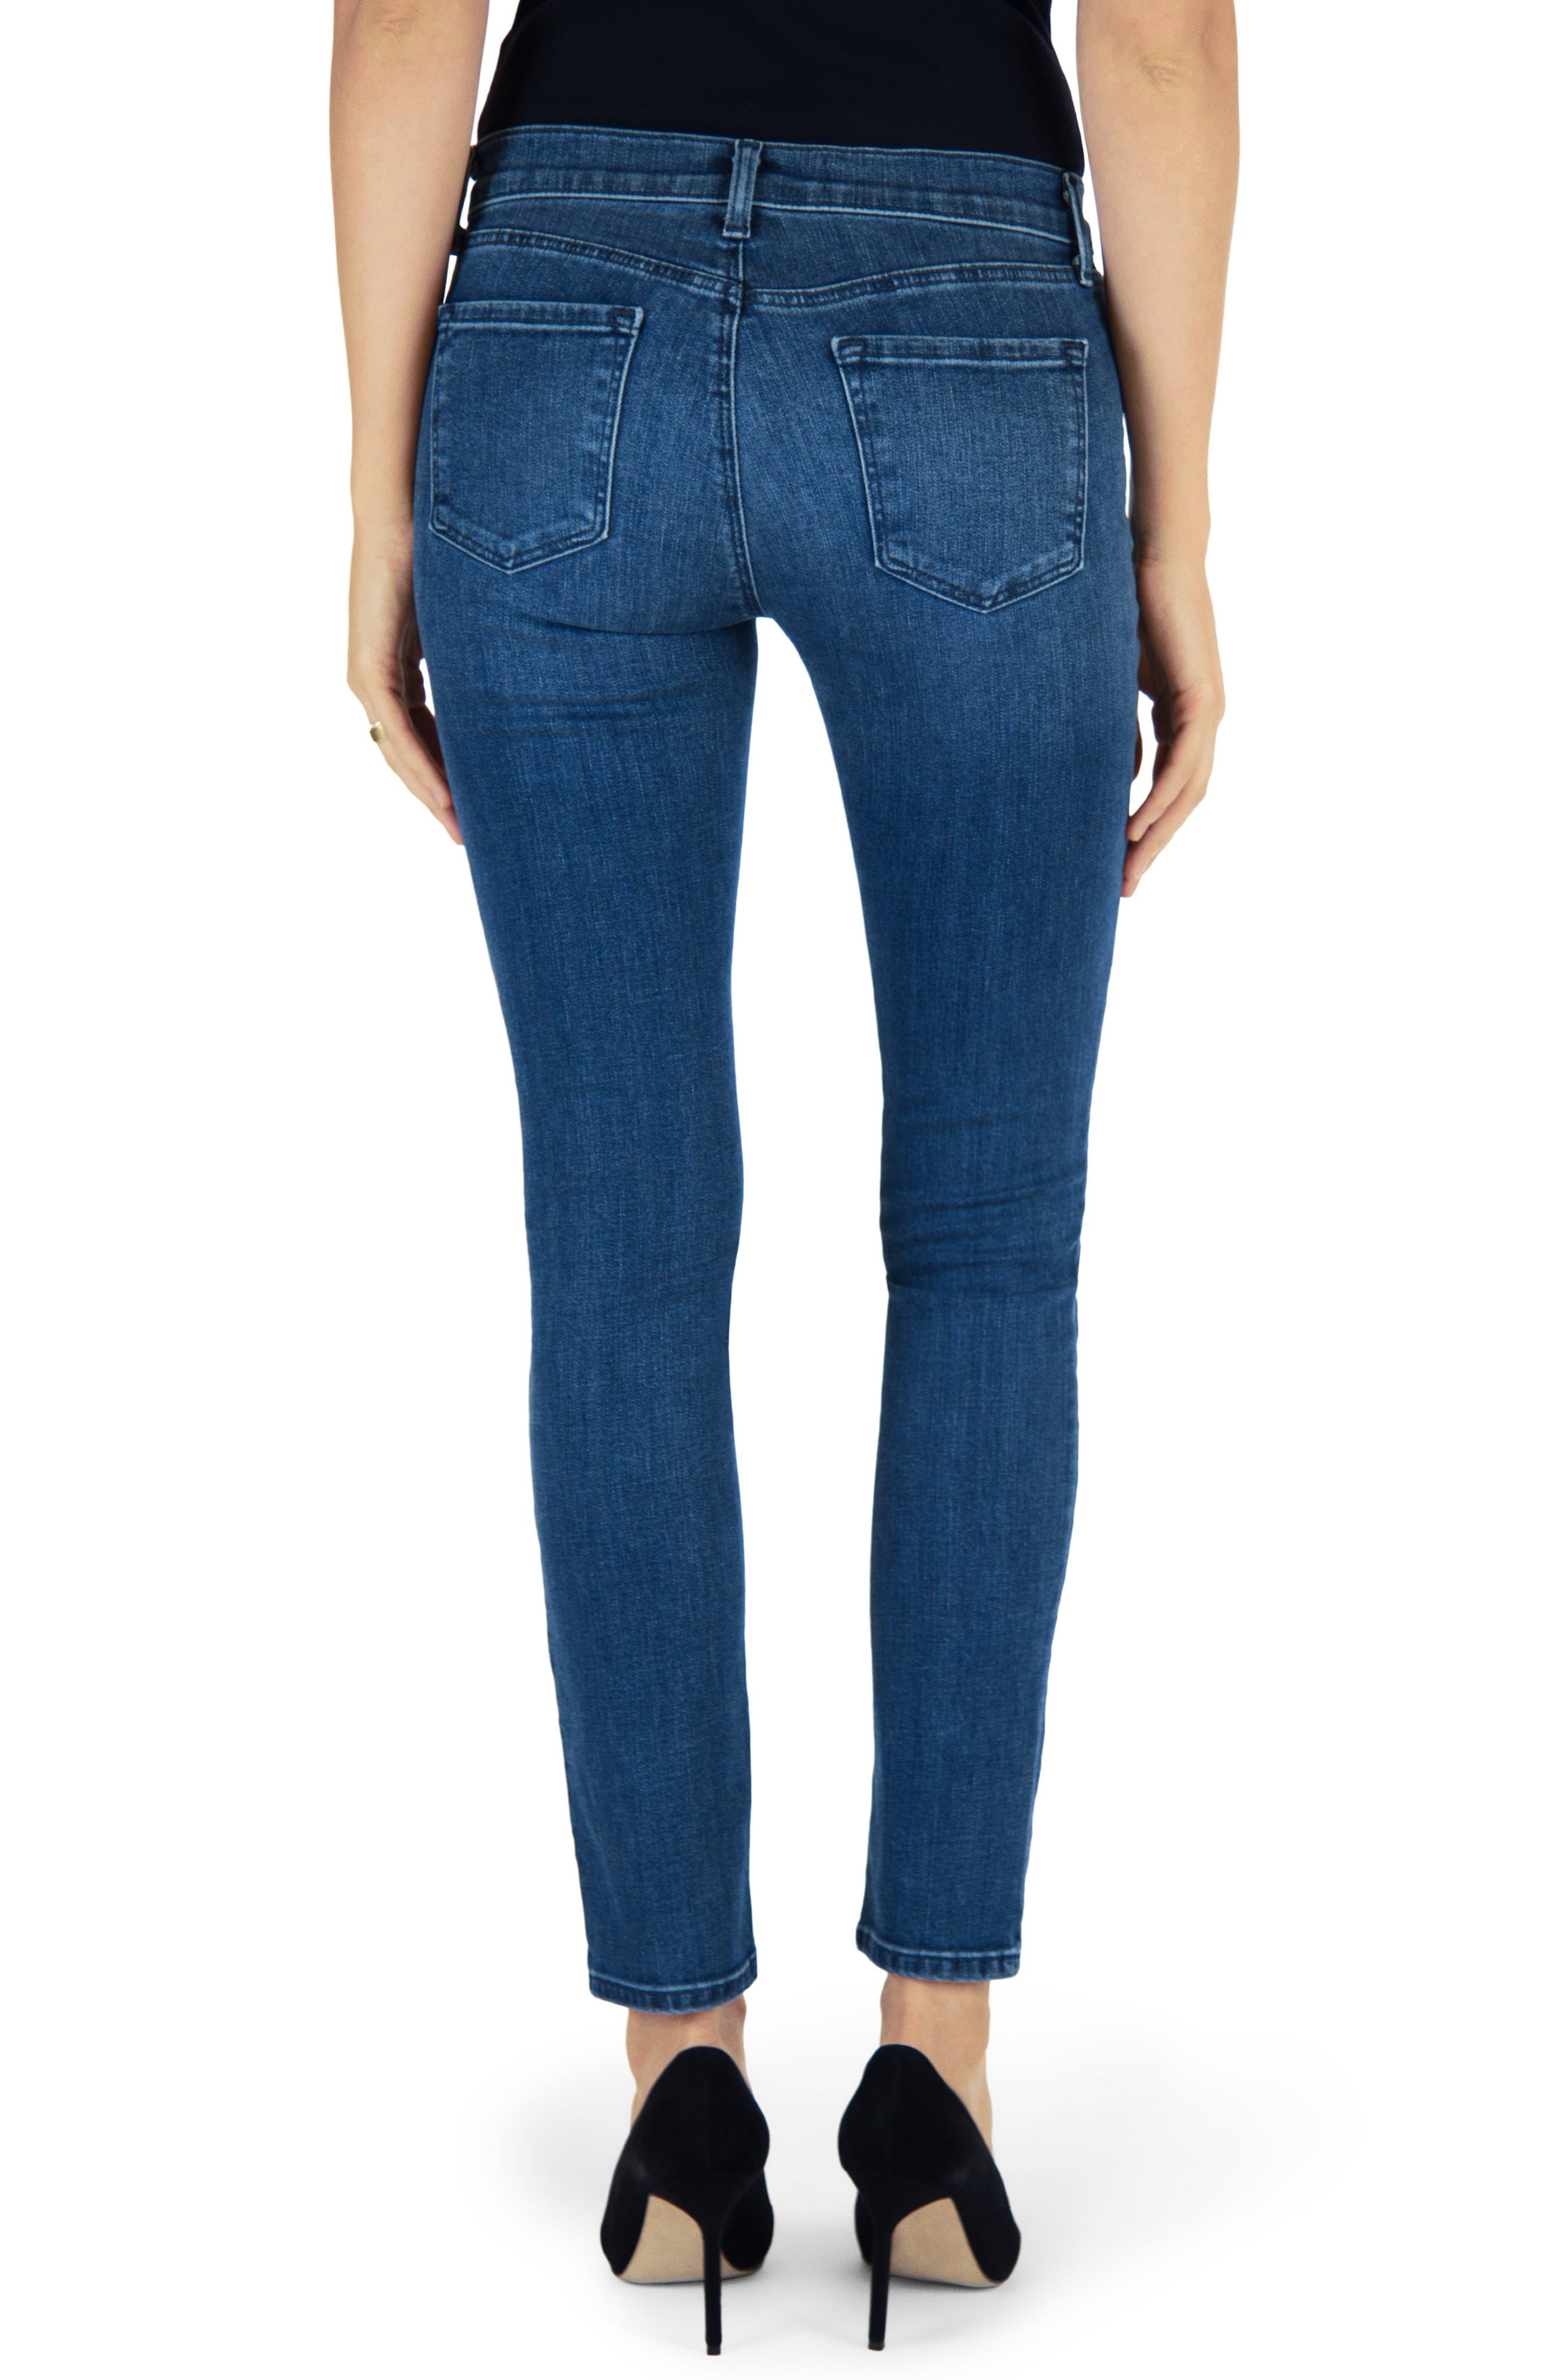 811 Skinny Jeans,                             Alternate thumbnail 2, color,                             Fuse